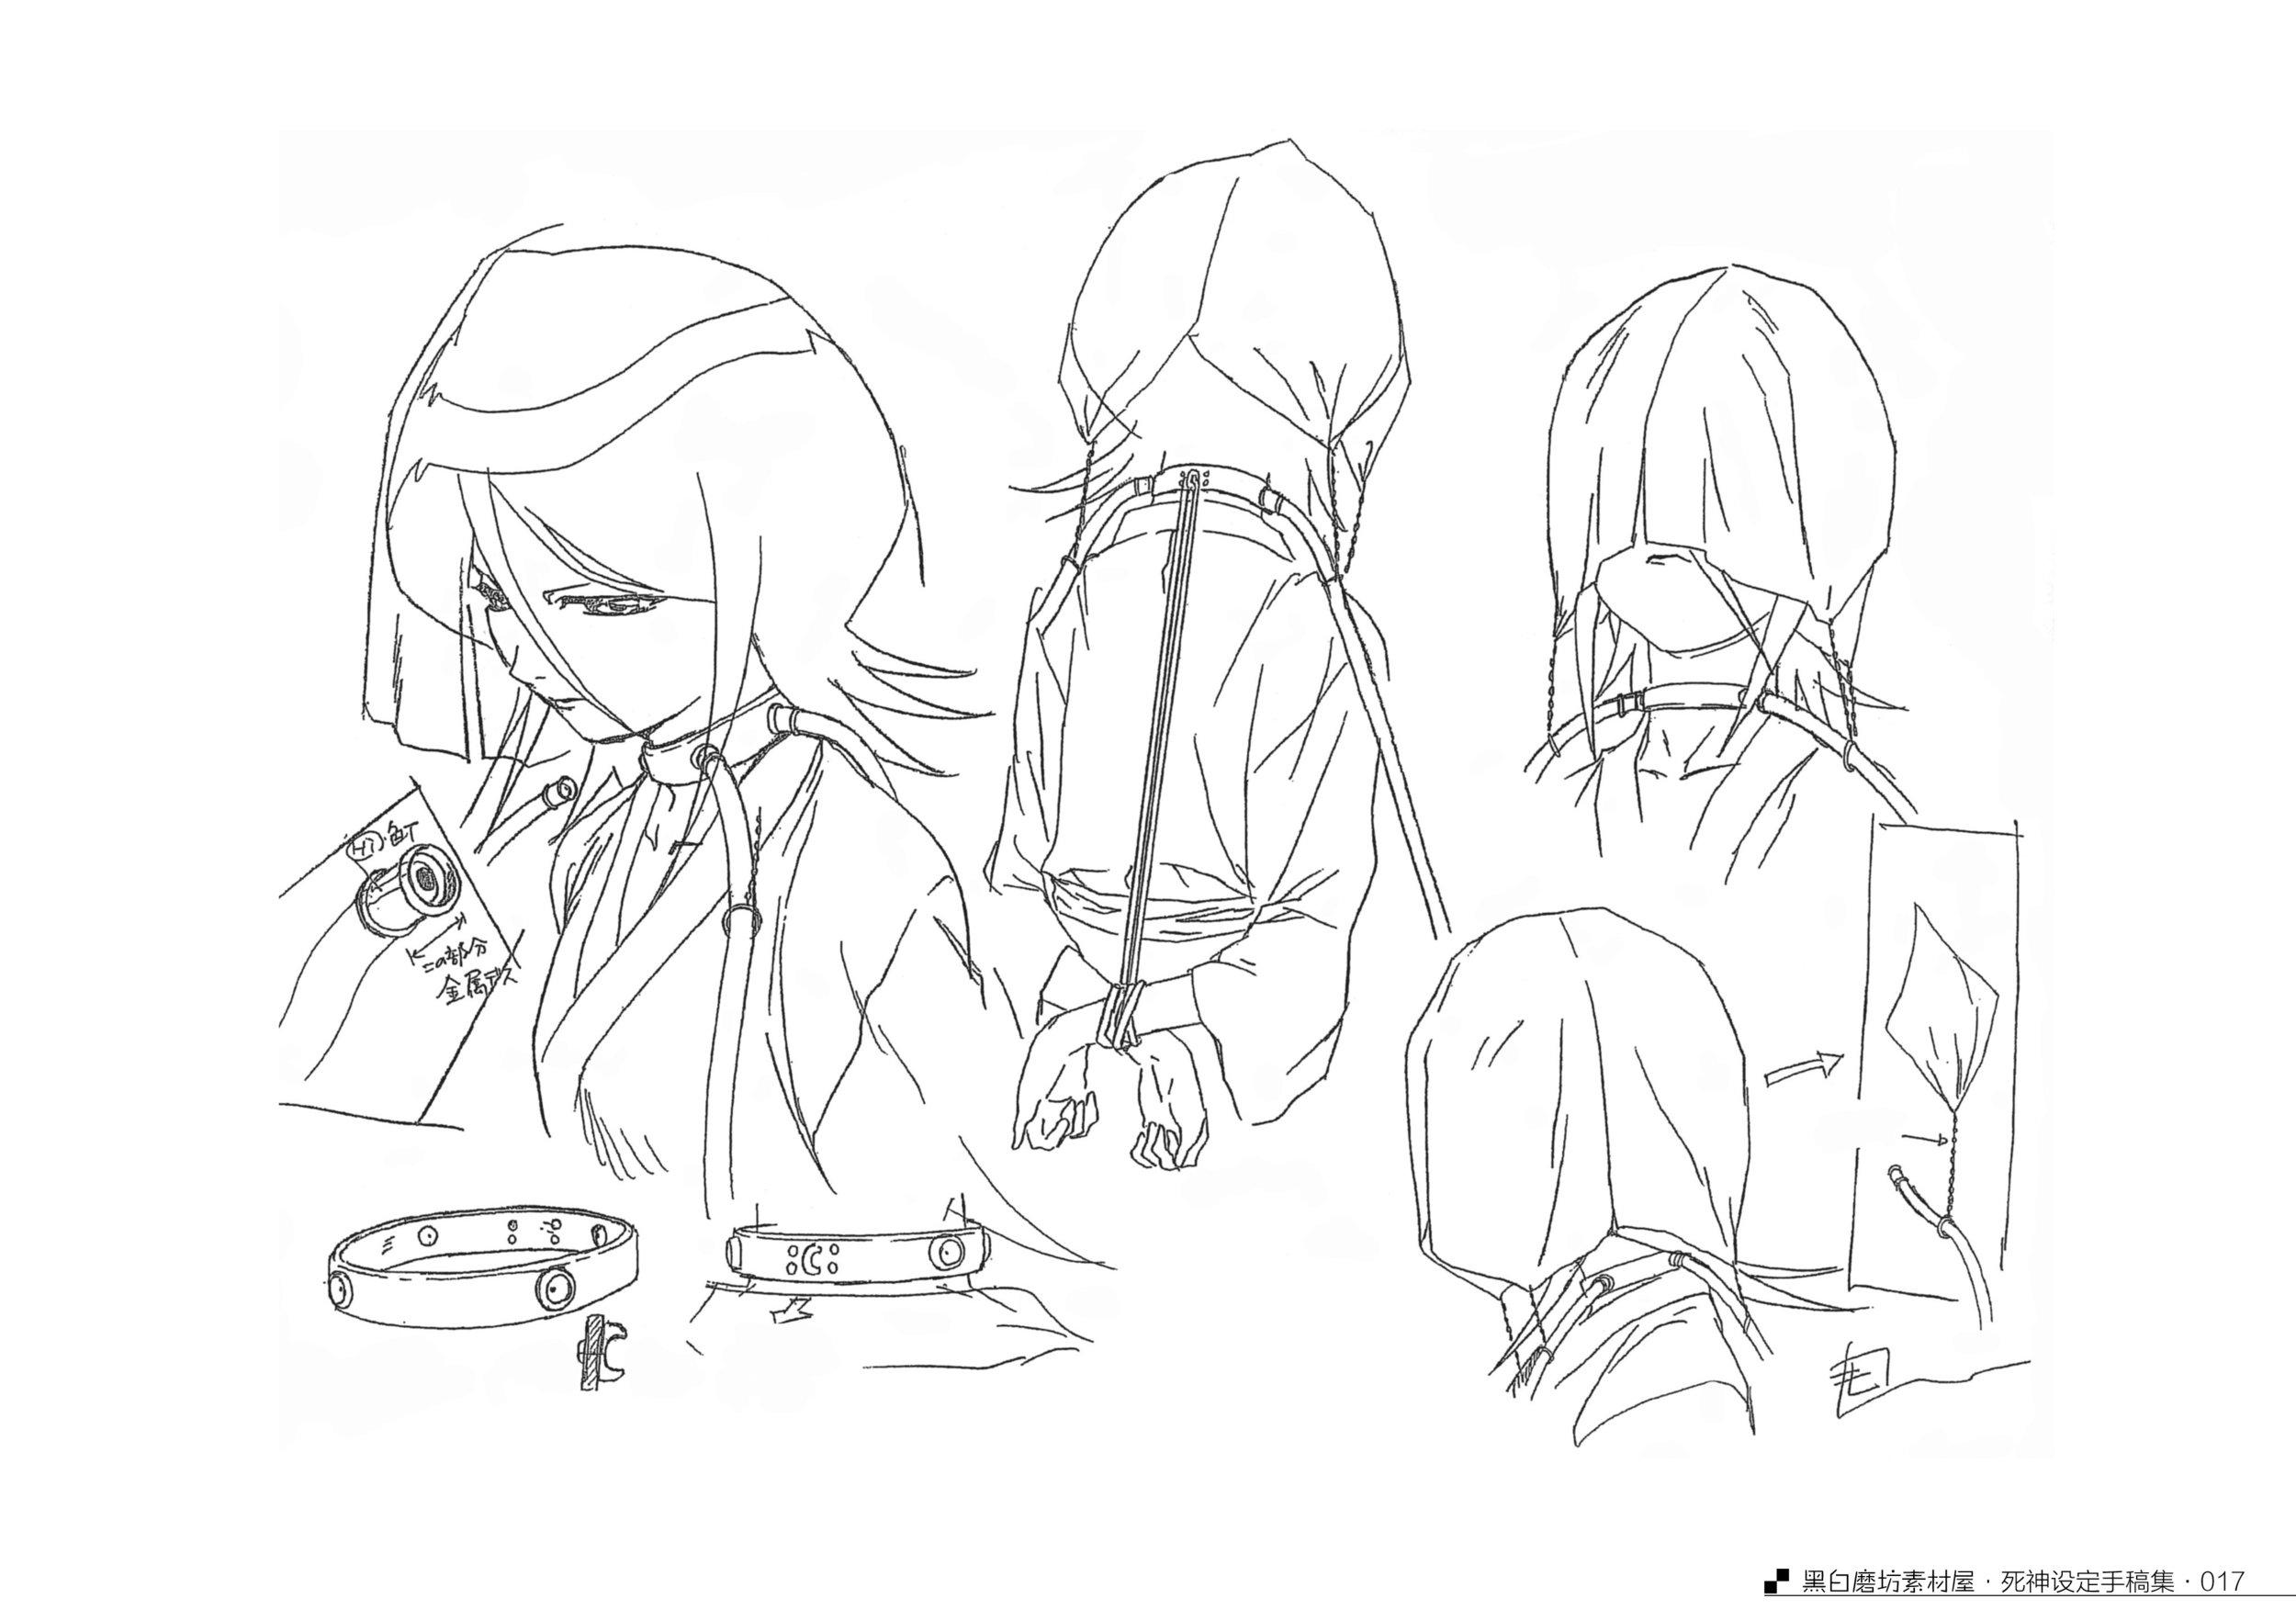 Art of the Bleach A - 16.jpg